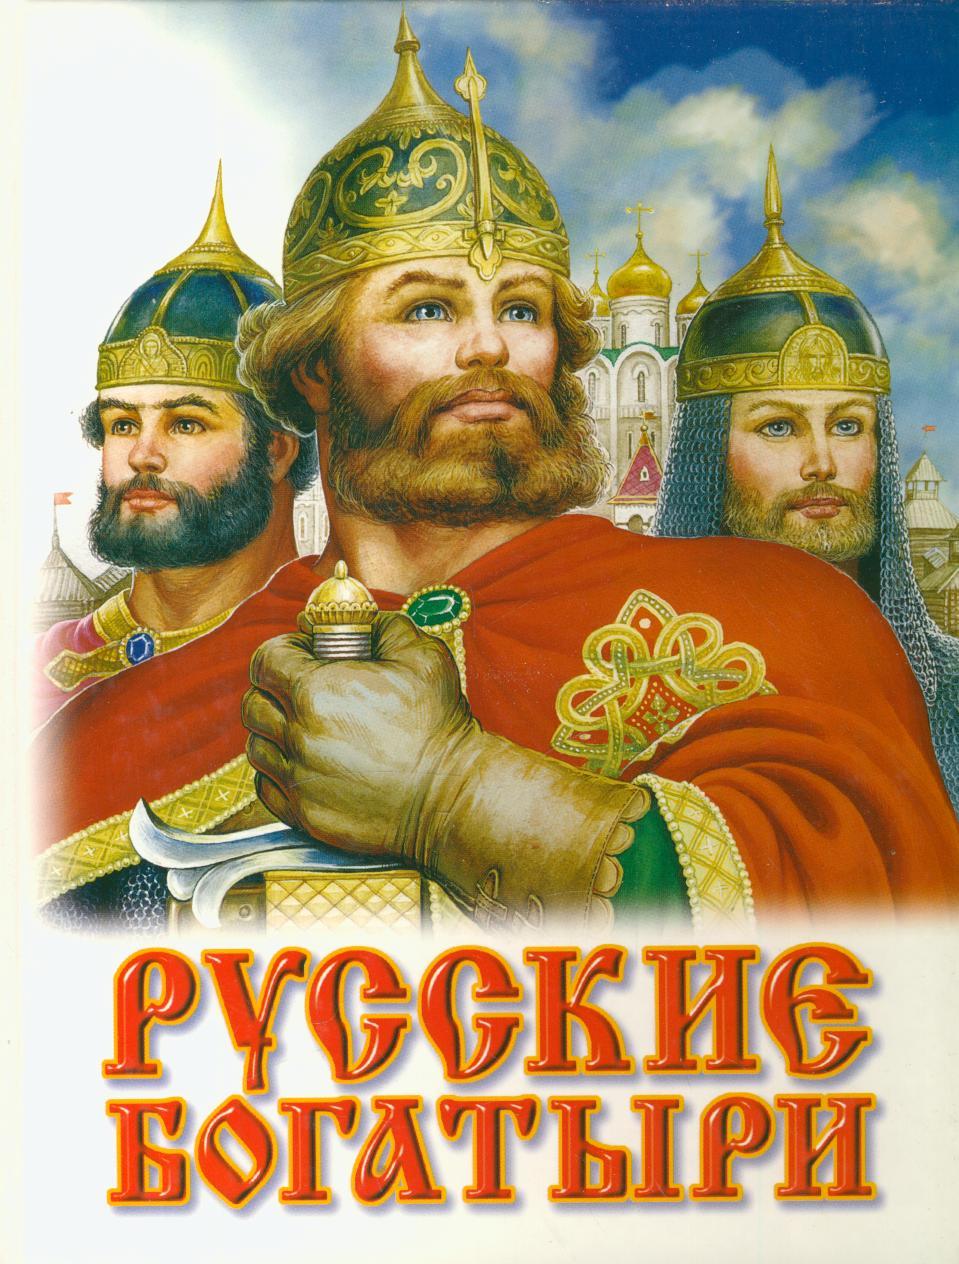 http://old.prodalit.ru/images/460000/458591.jpg